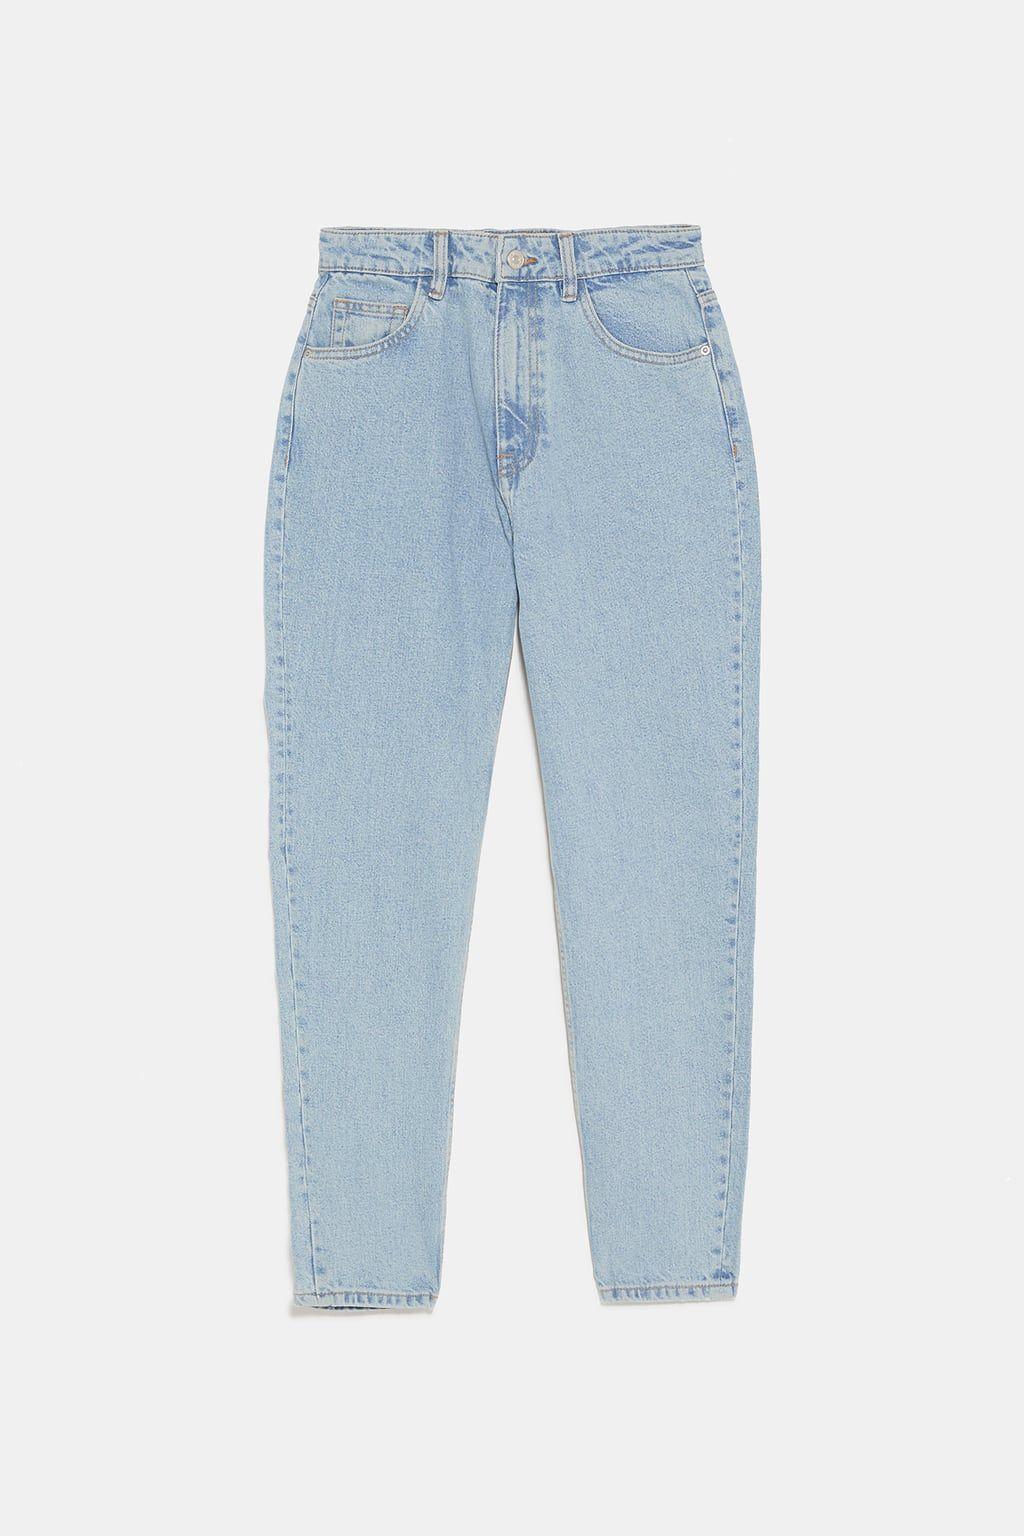 094e92fb8d10 Zara  trendynotes  getthelook  fashioninspo  influencer  ChiaraFerragni   maispormenos